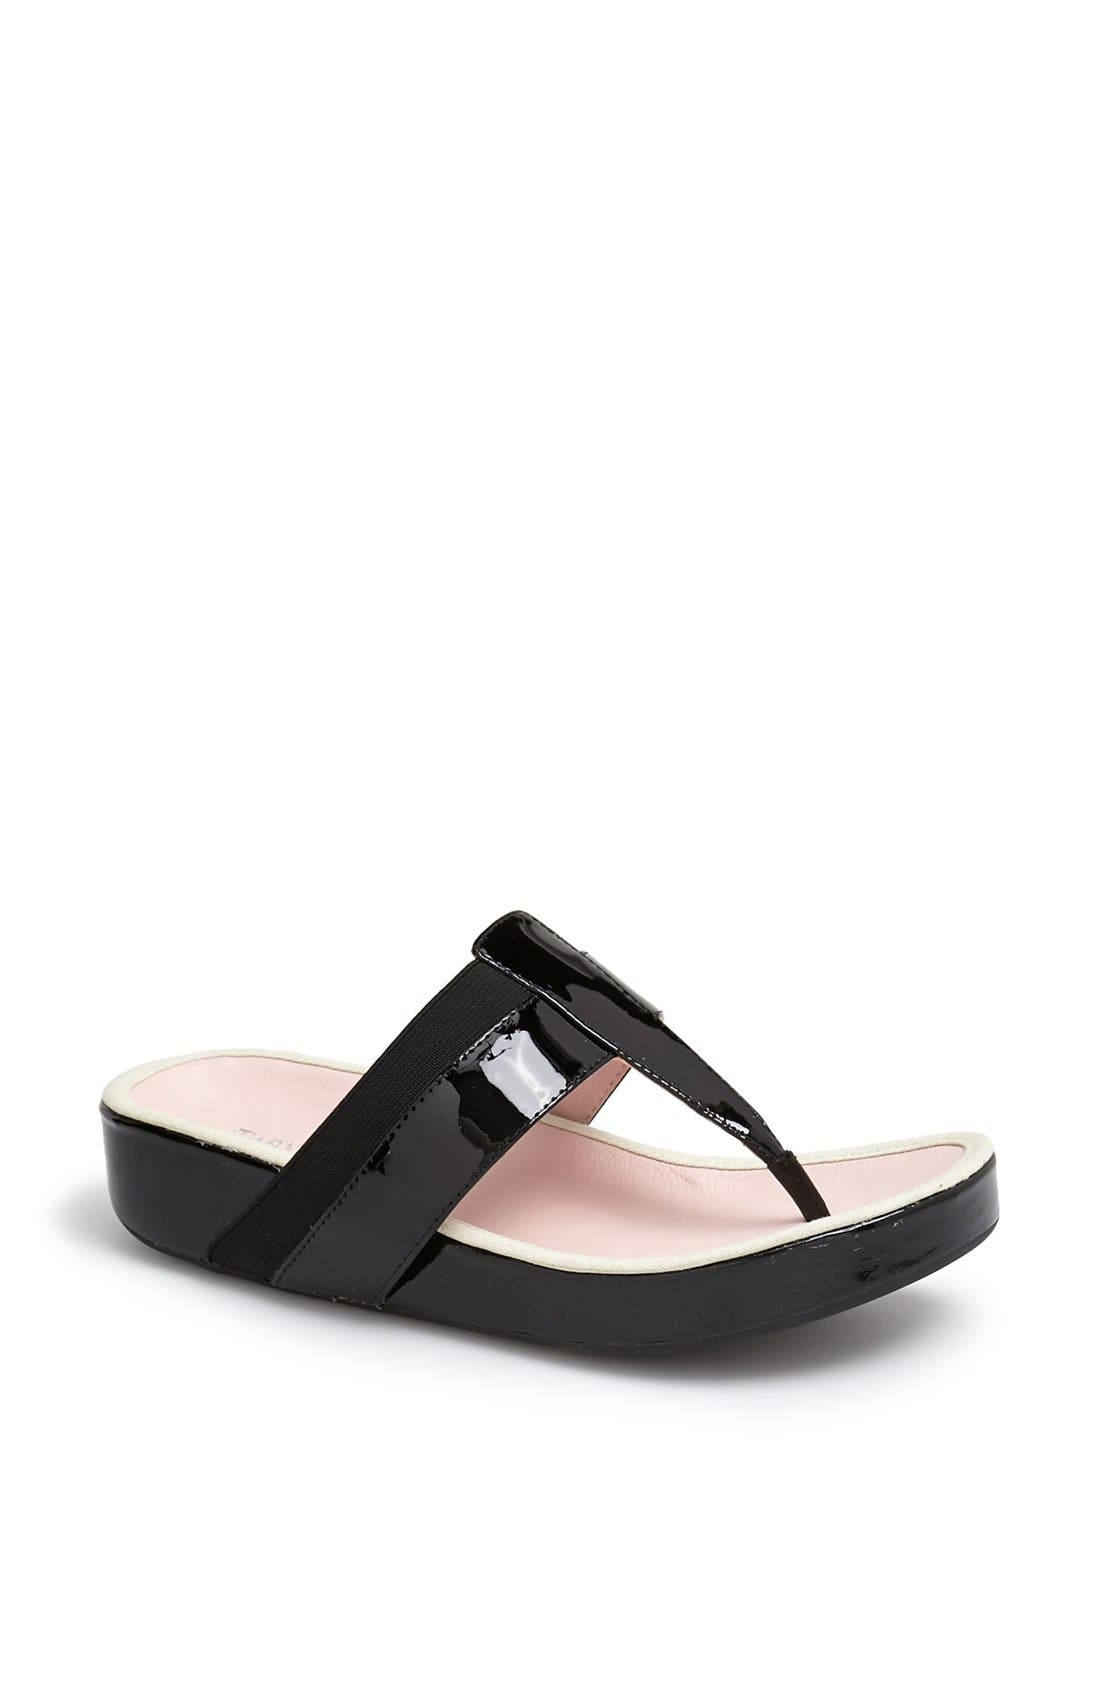 Alternate Image 1 Selected - Taryn Rose 'August' Thong Sandal